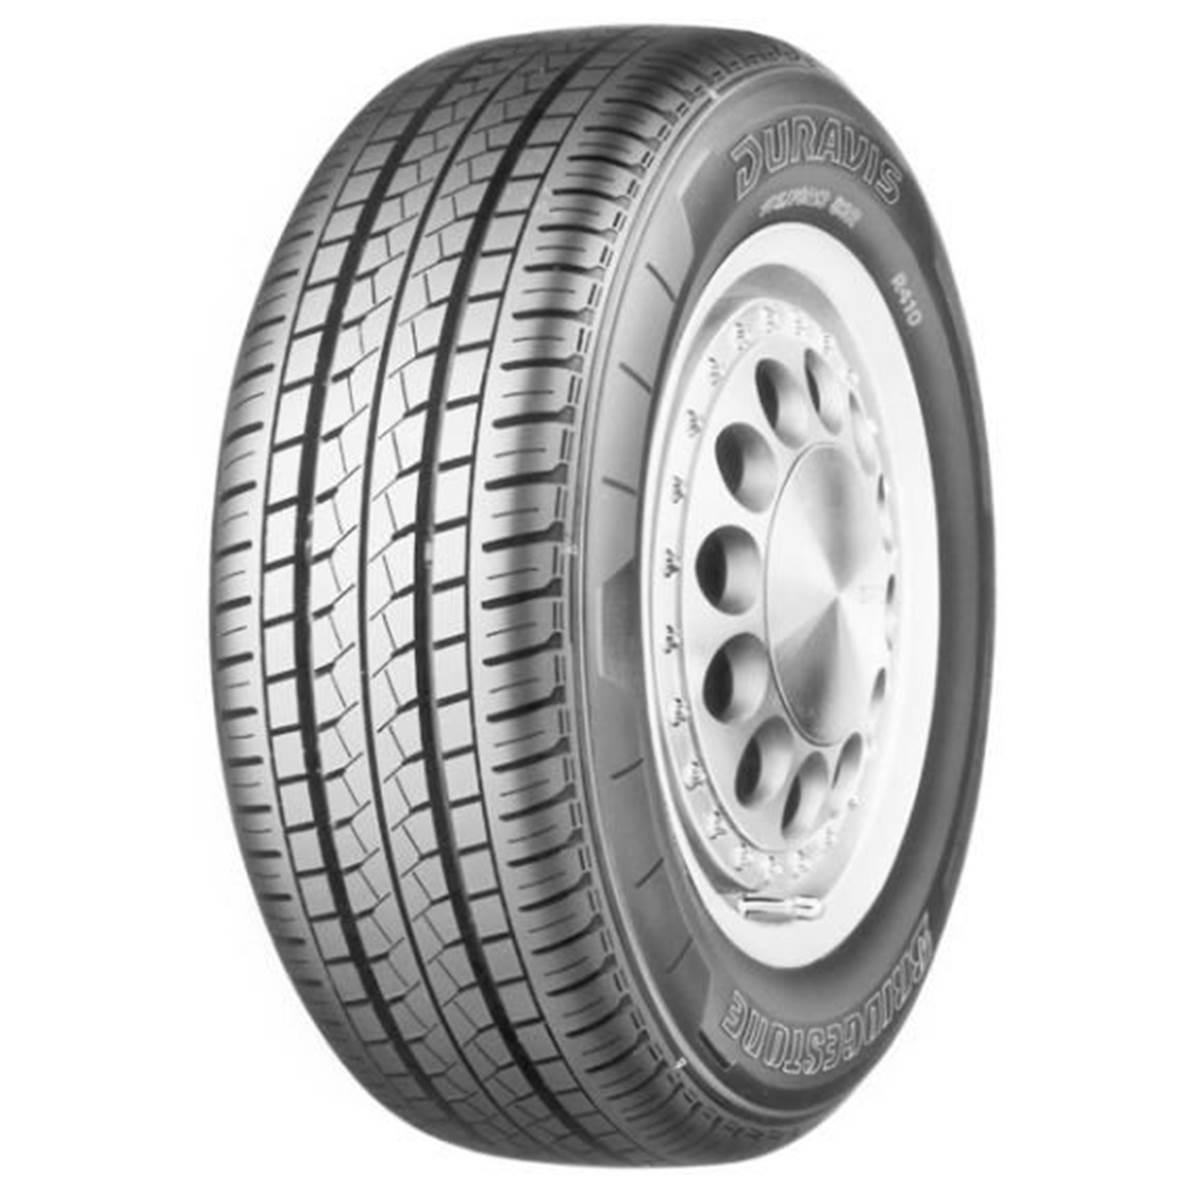 Pneu Camionnette Bridgestone 205/65R15 102T Duravis R410